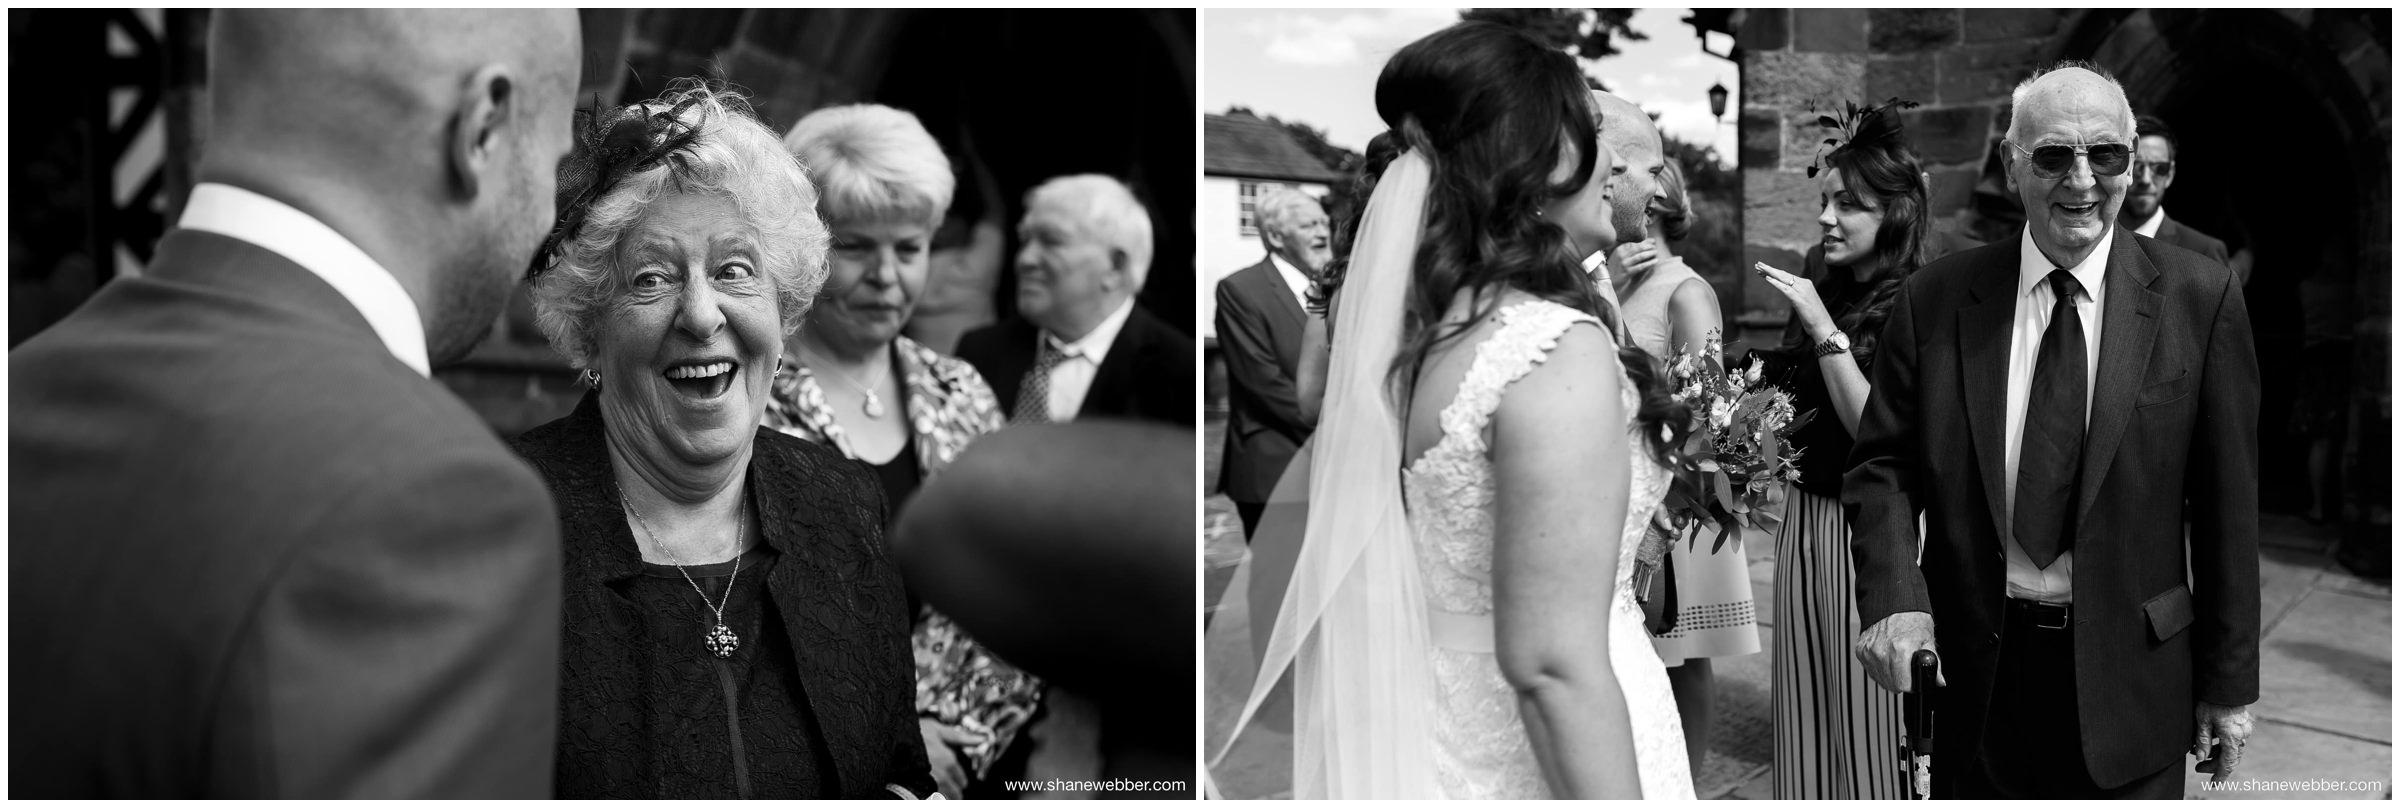 Black and white natural wedding photos